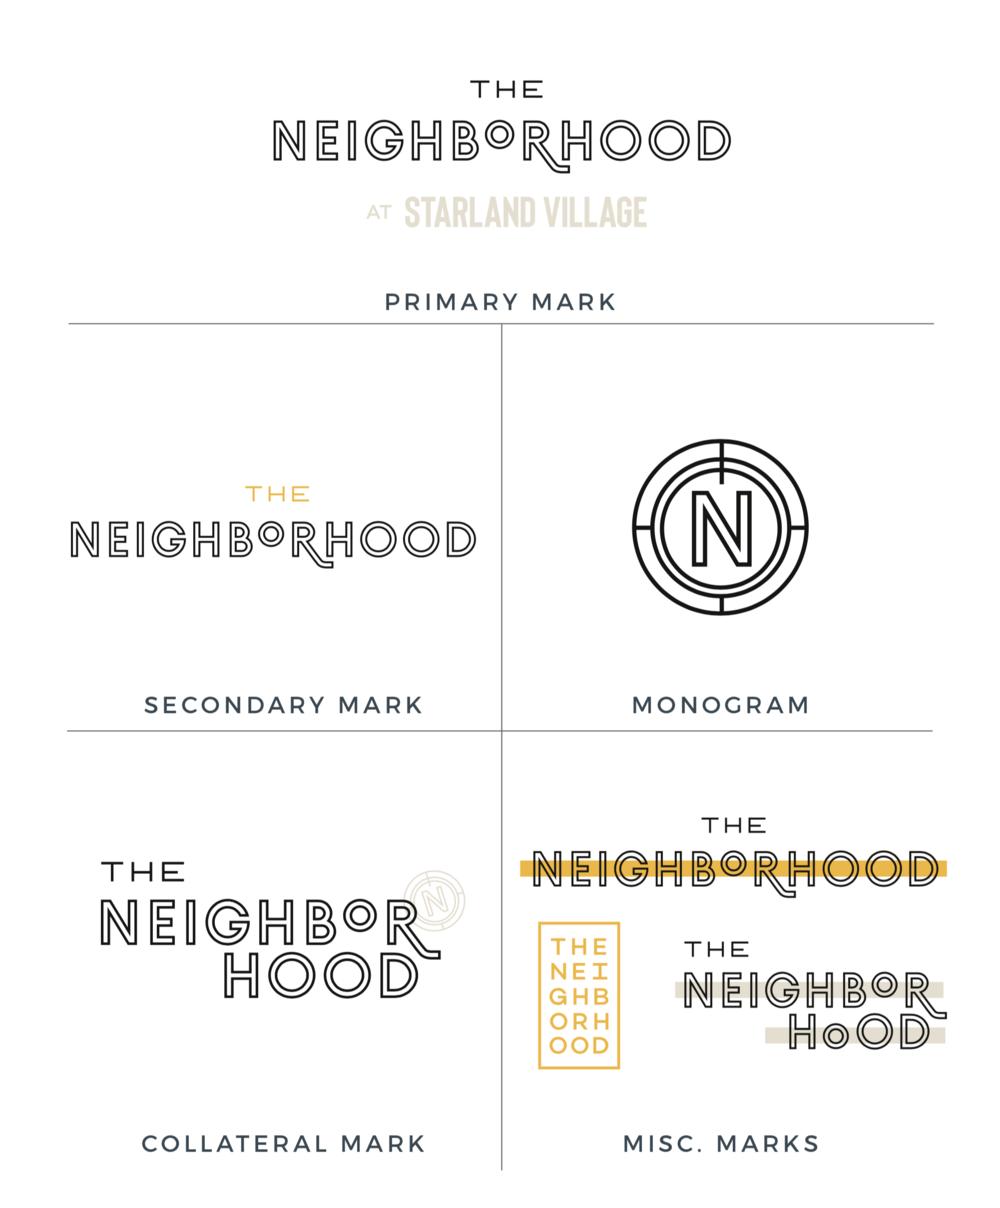 Flourish-Collaborative-Branding-Agency-Savannah--Starland-Village-The-Neighborhood-Logo2.png